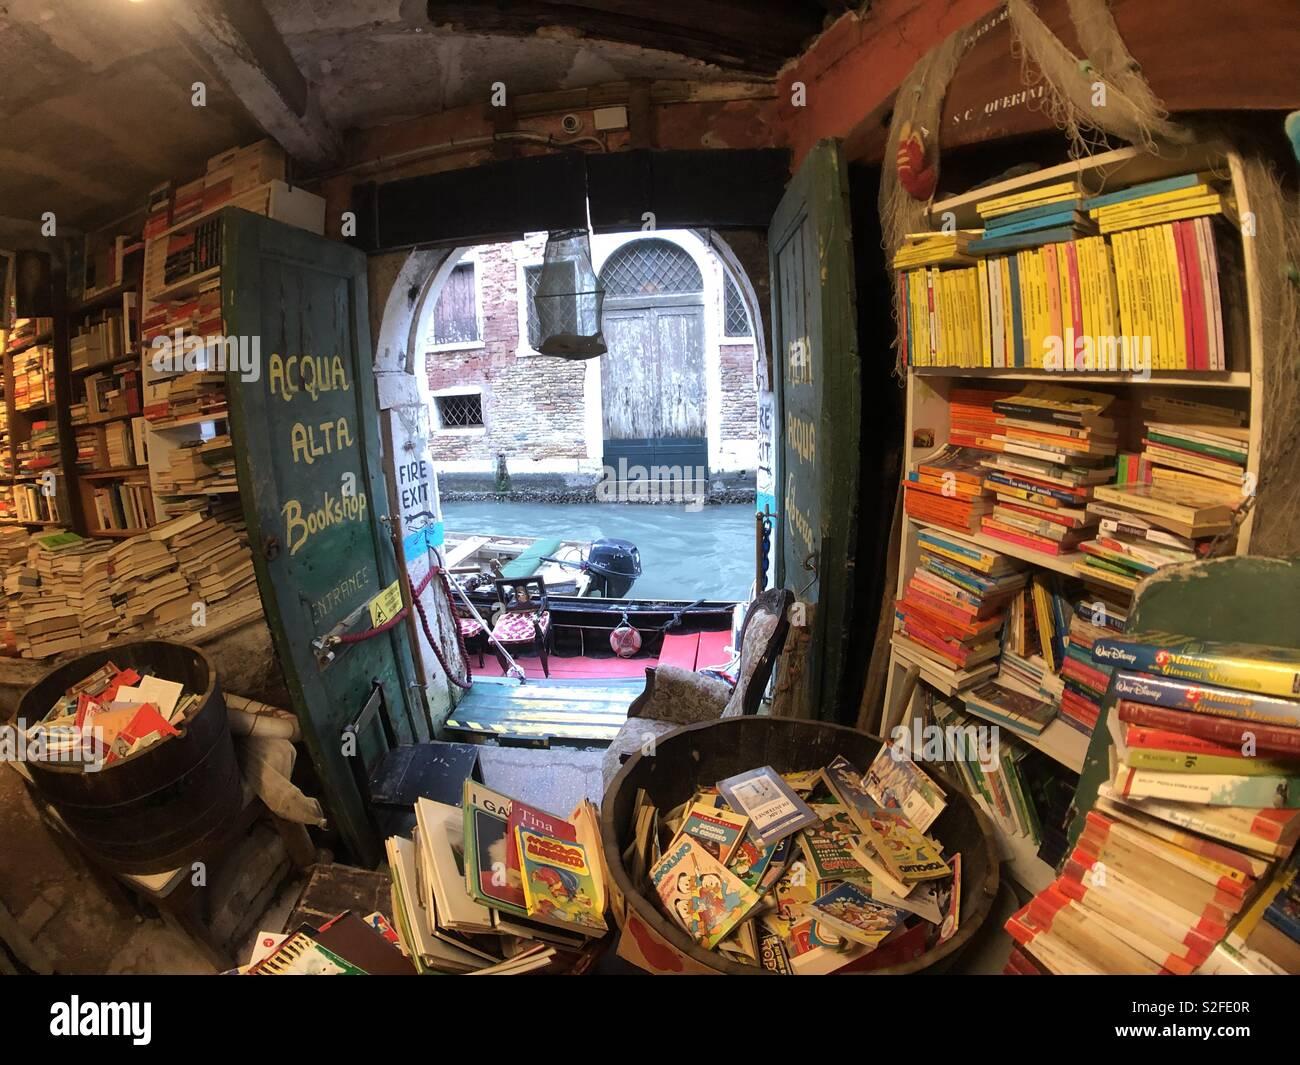 Acqua Alta bookshop in Venezia Foto Stock